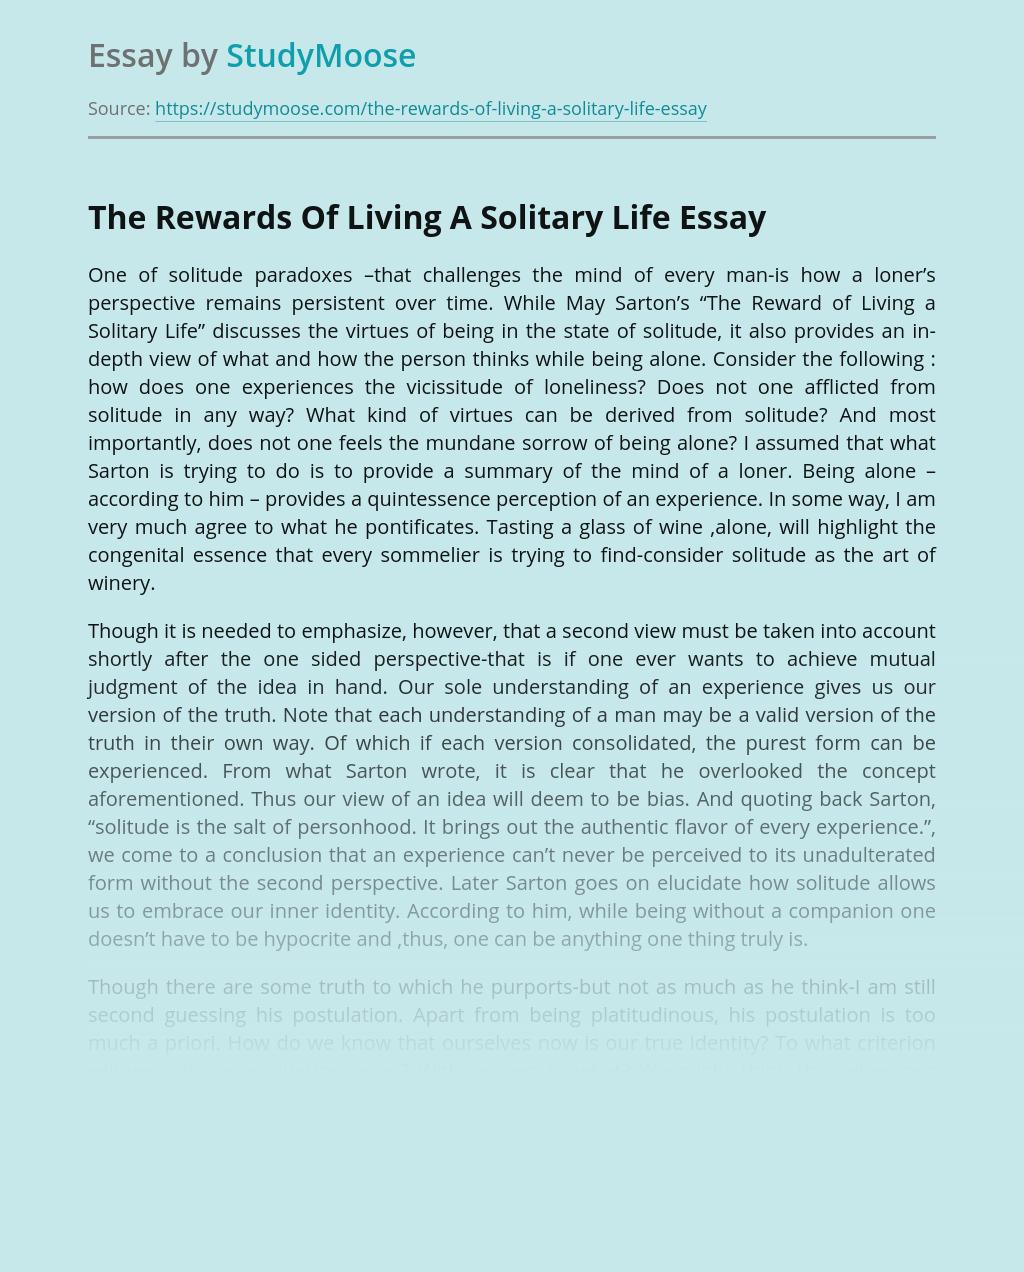 The Rewards Of Living A Solitary Life